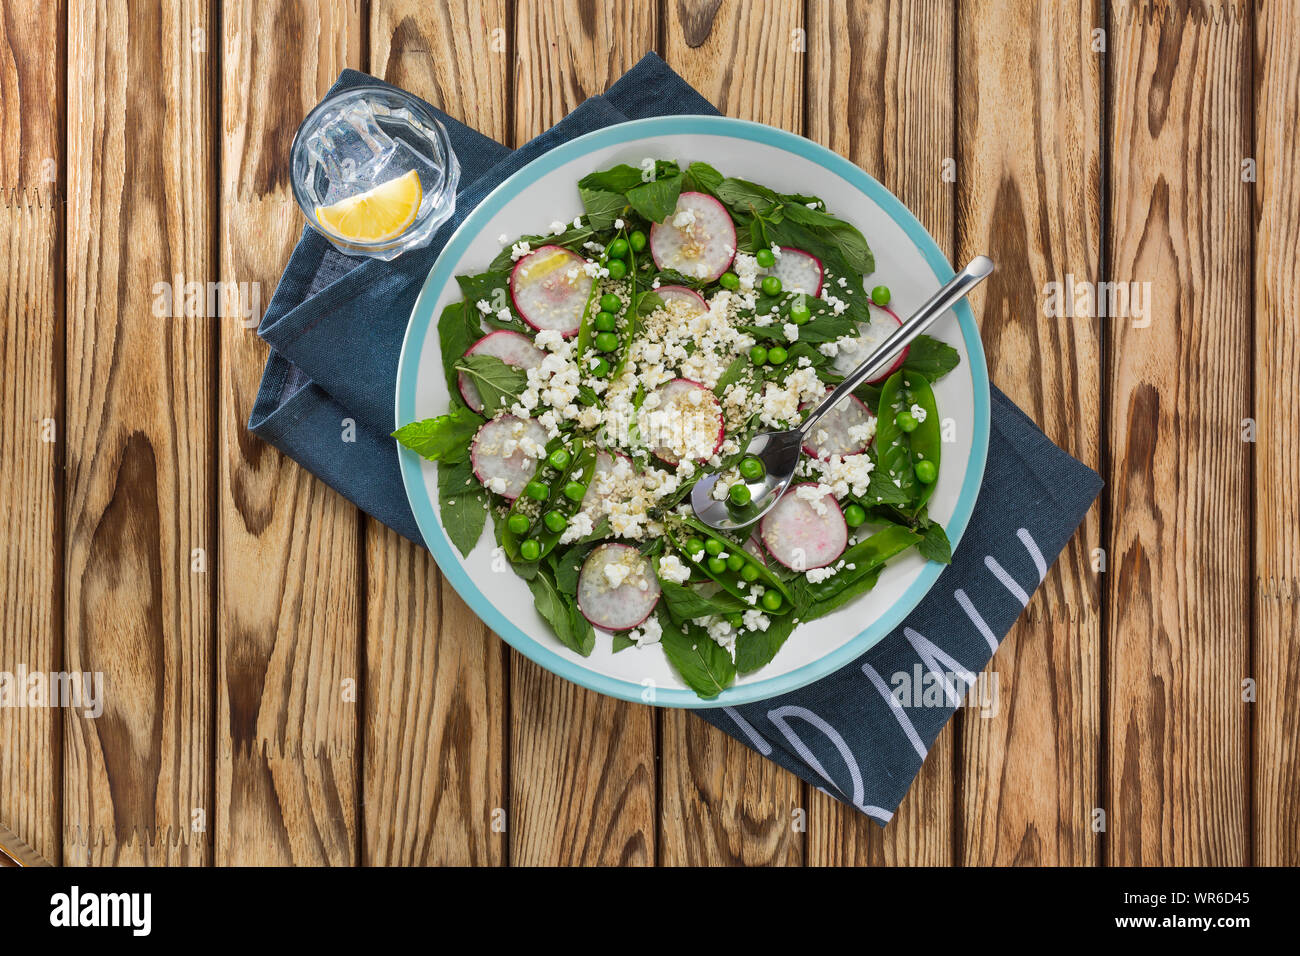 avocado, sheet pan, sugar snap peas, fennel, cucumber salad, beet salad recipe, beet salad recipe, quinoa salad, fennel radish Stock Photo